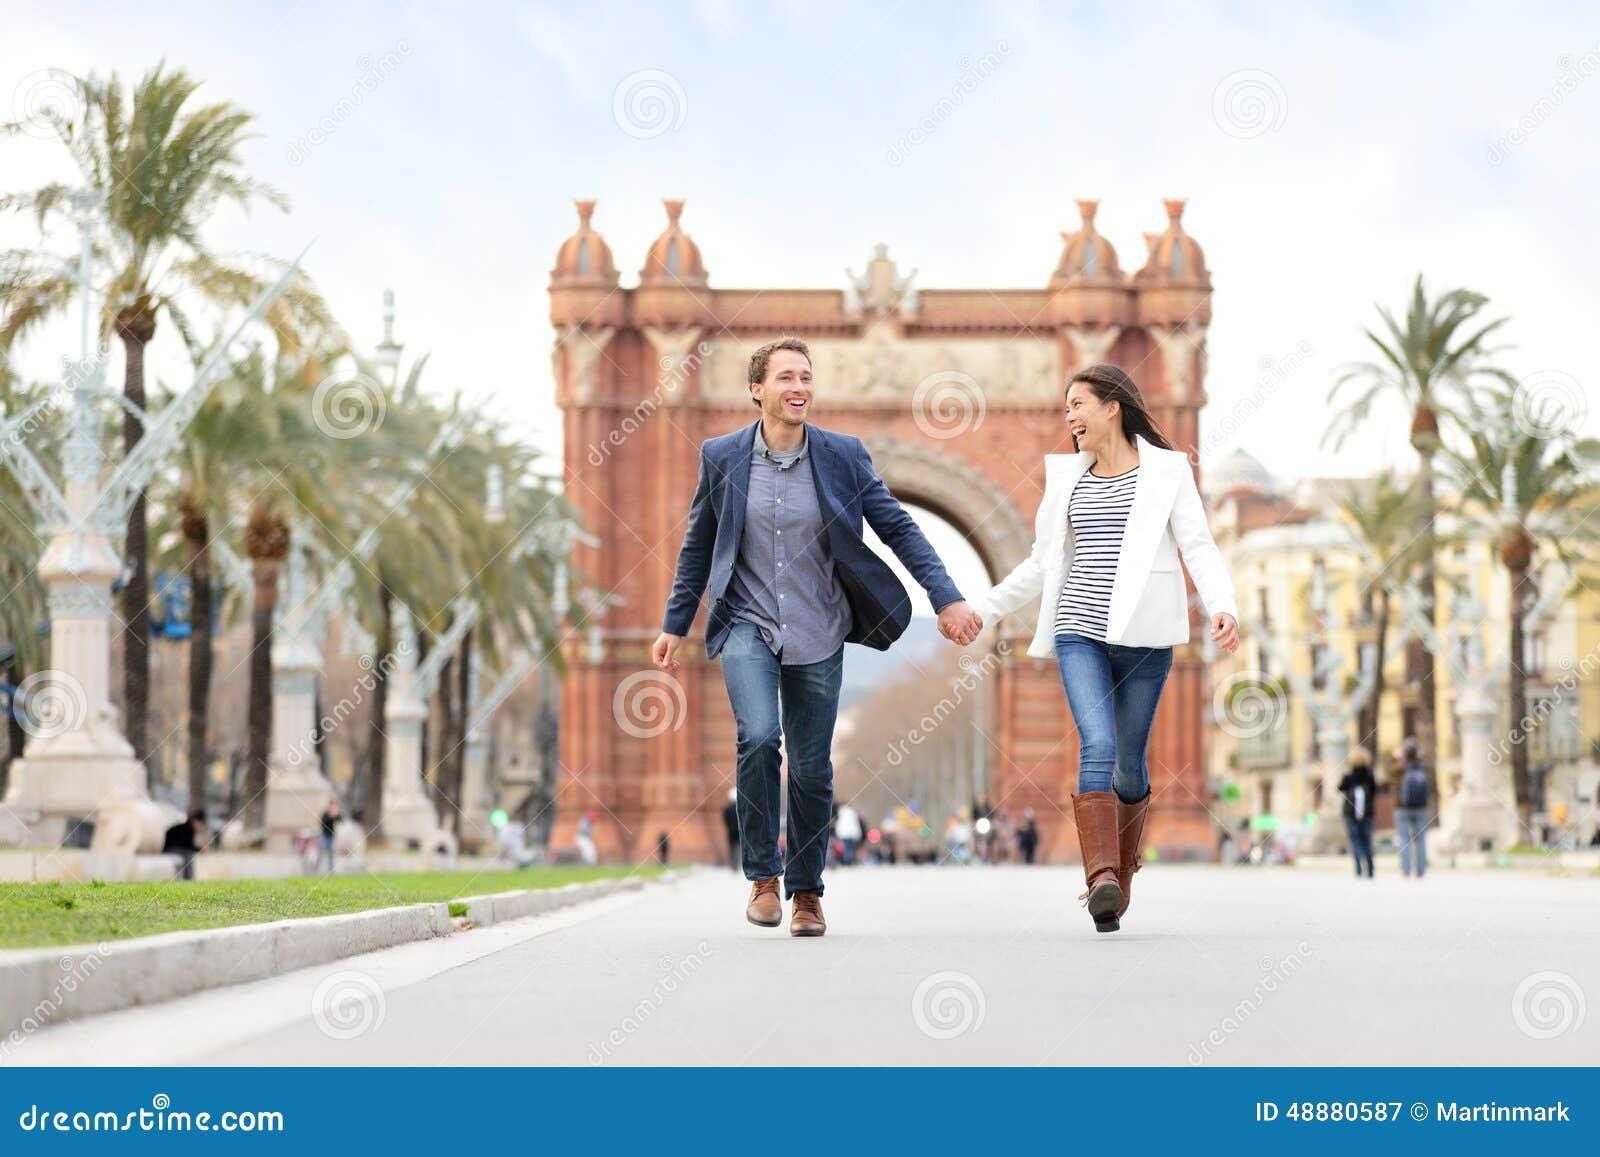 Australian Free Dating online